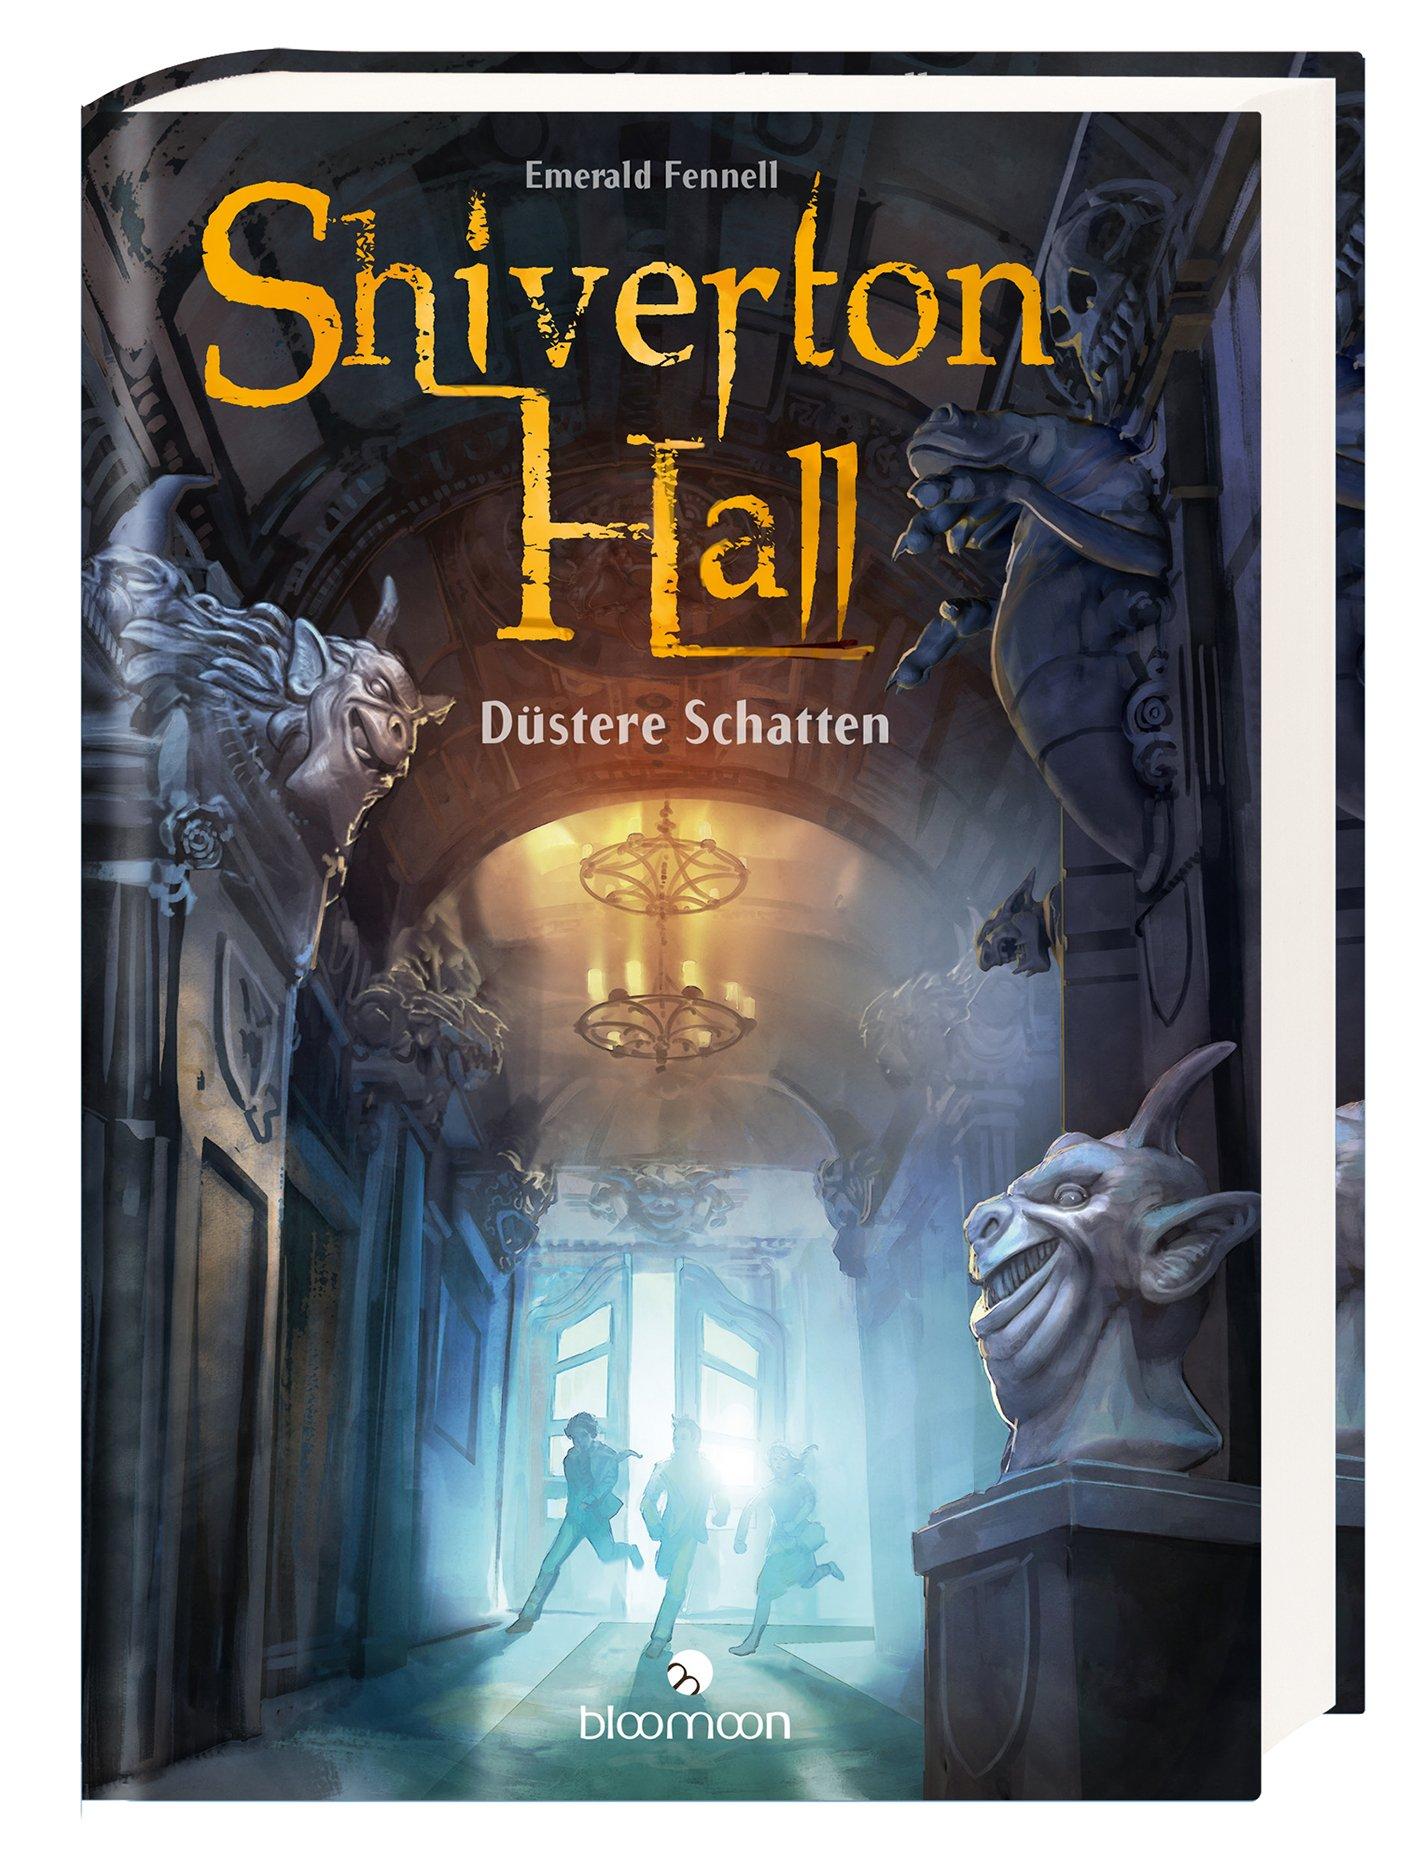 Shiverton Hall - Düstere Schatten (Emerald Fennell)